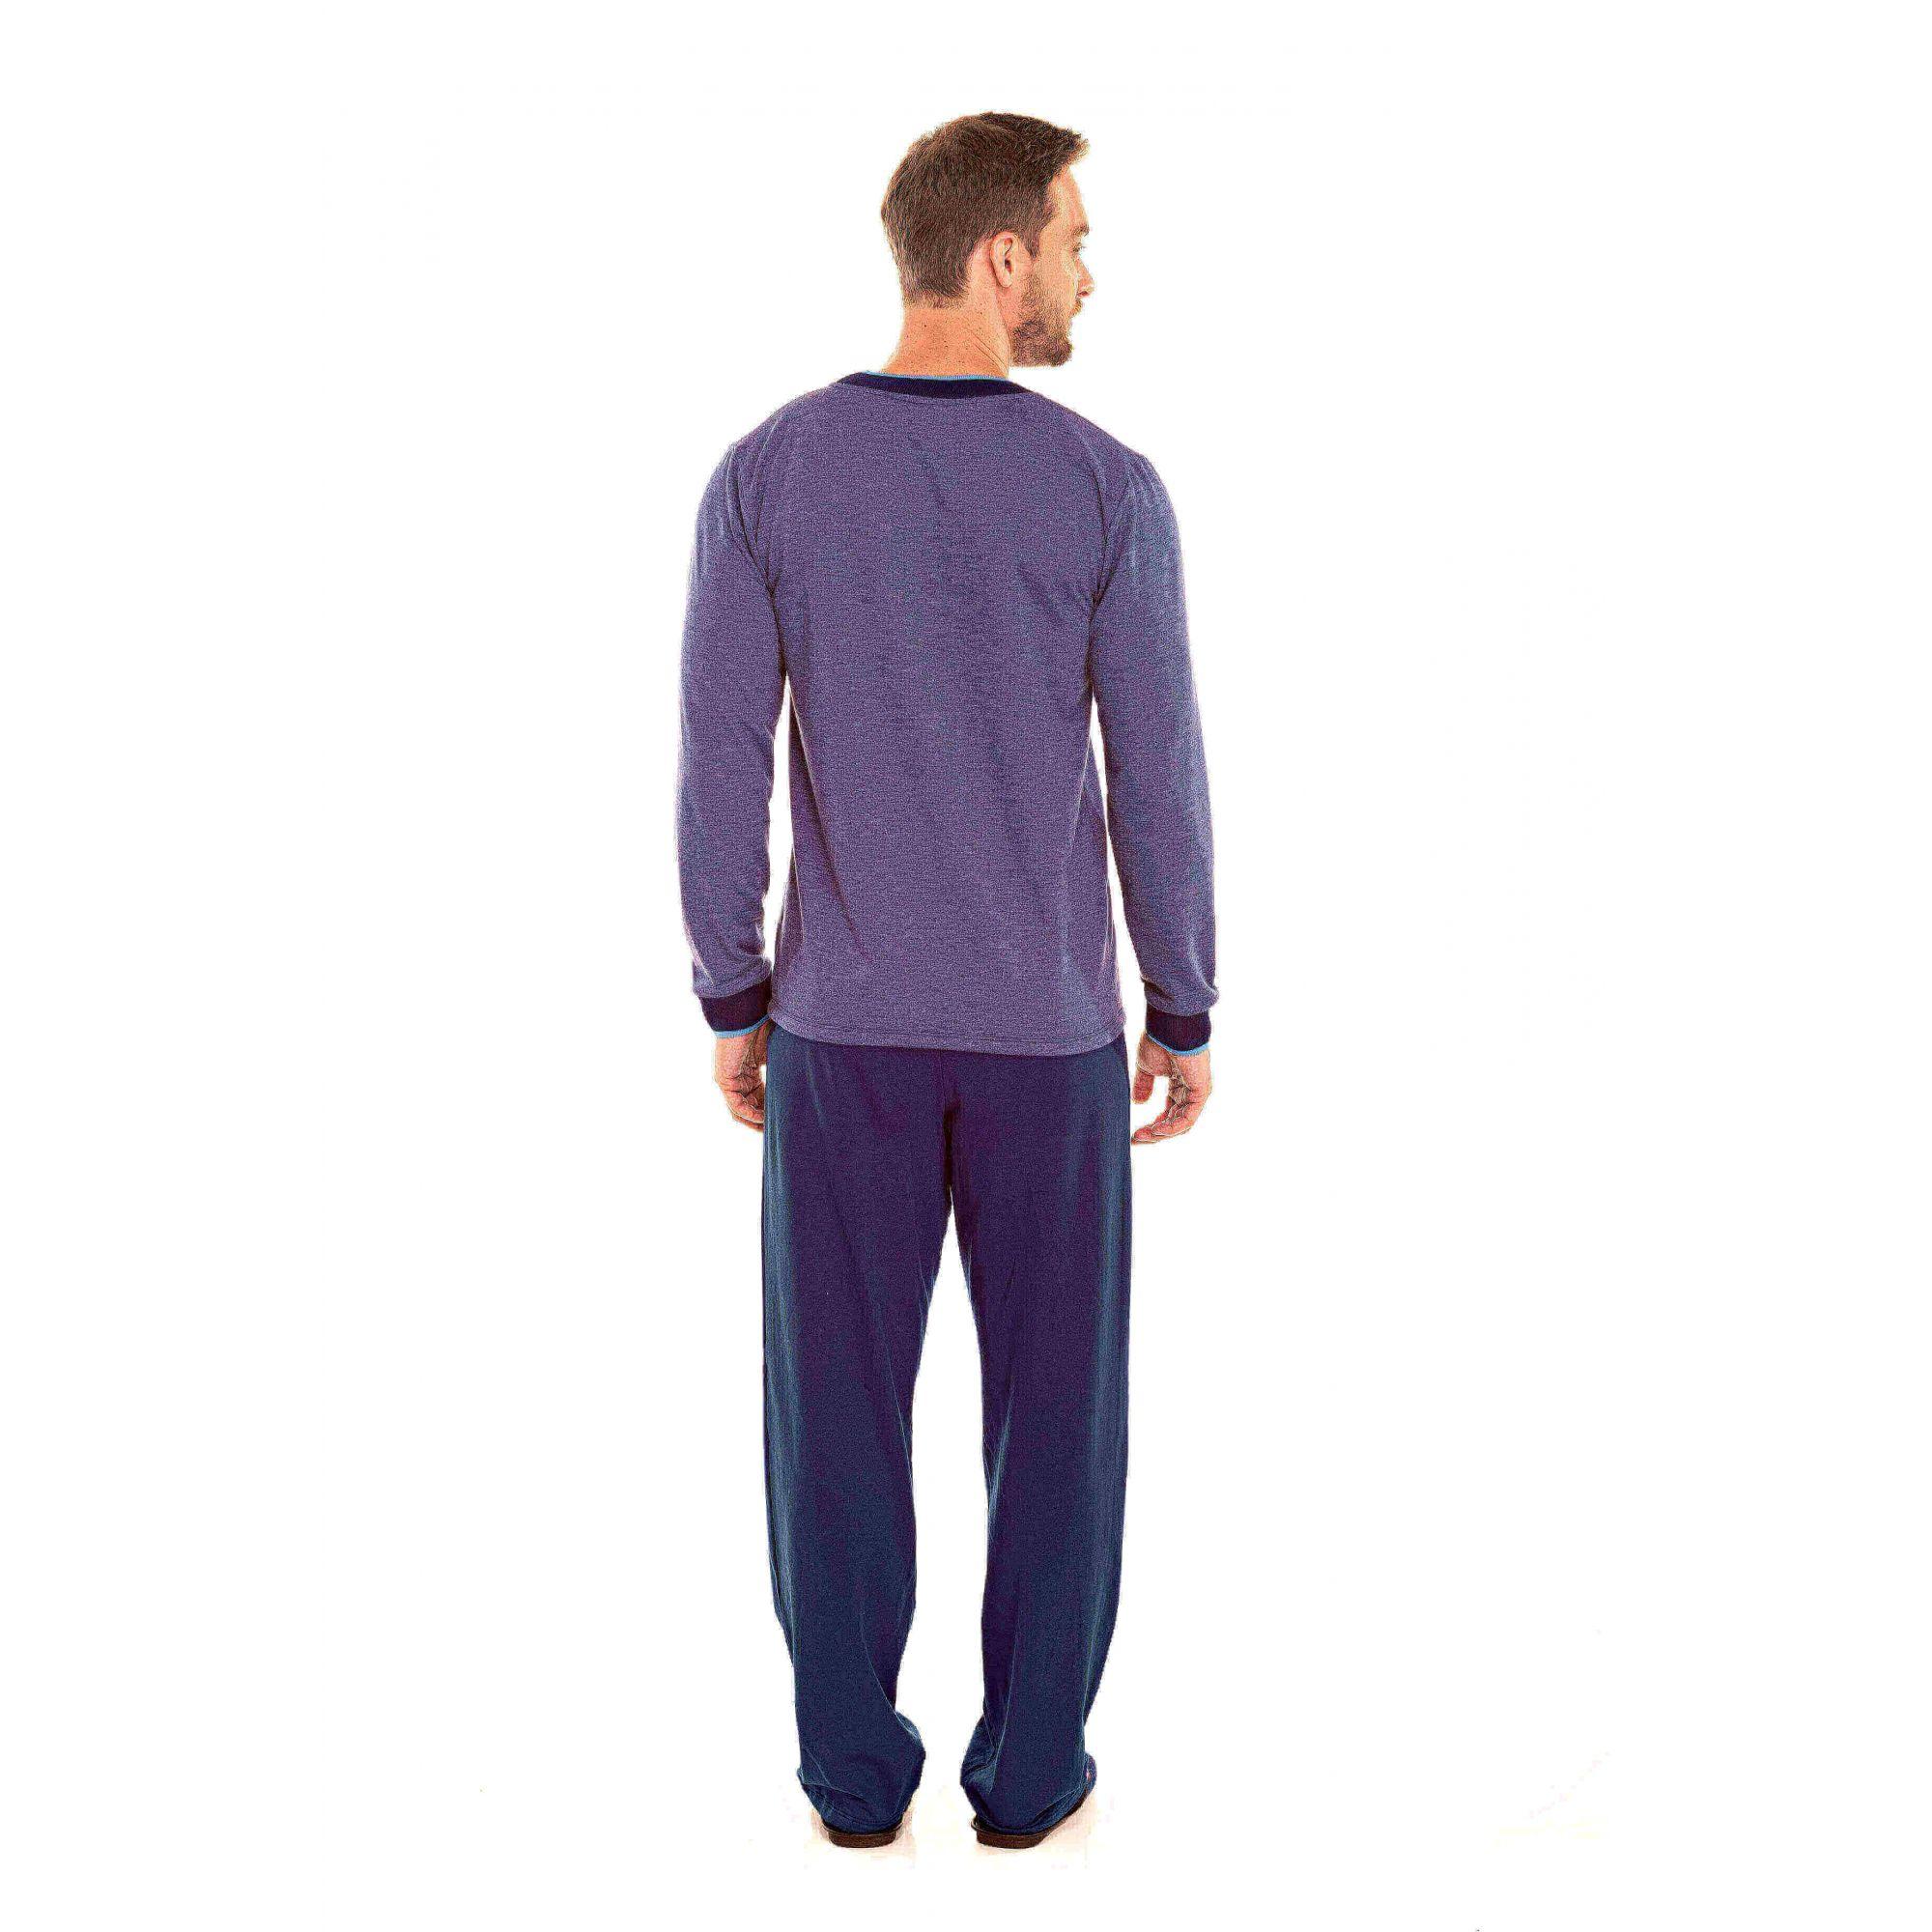 Pijama Adulto Masculino Moletinho